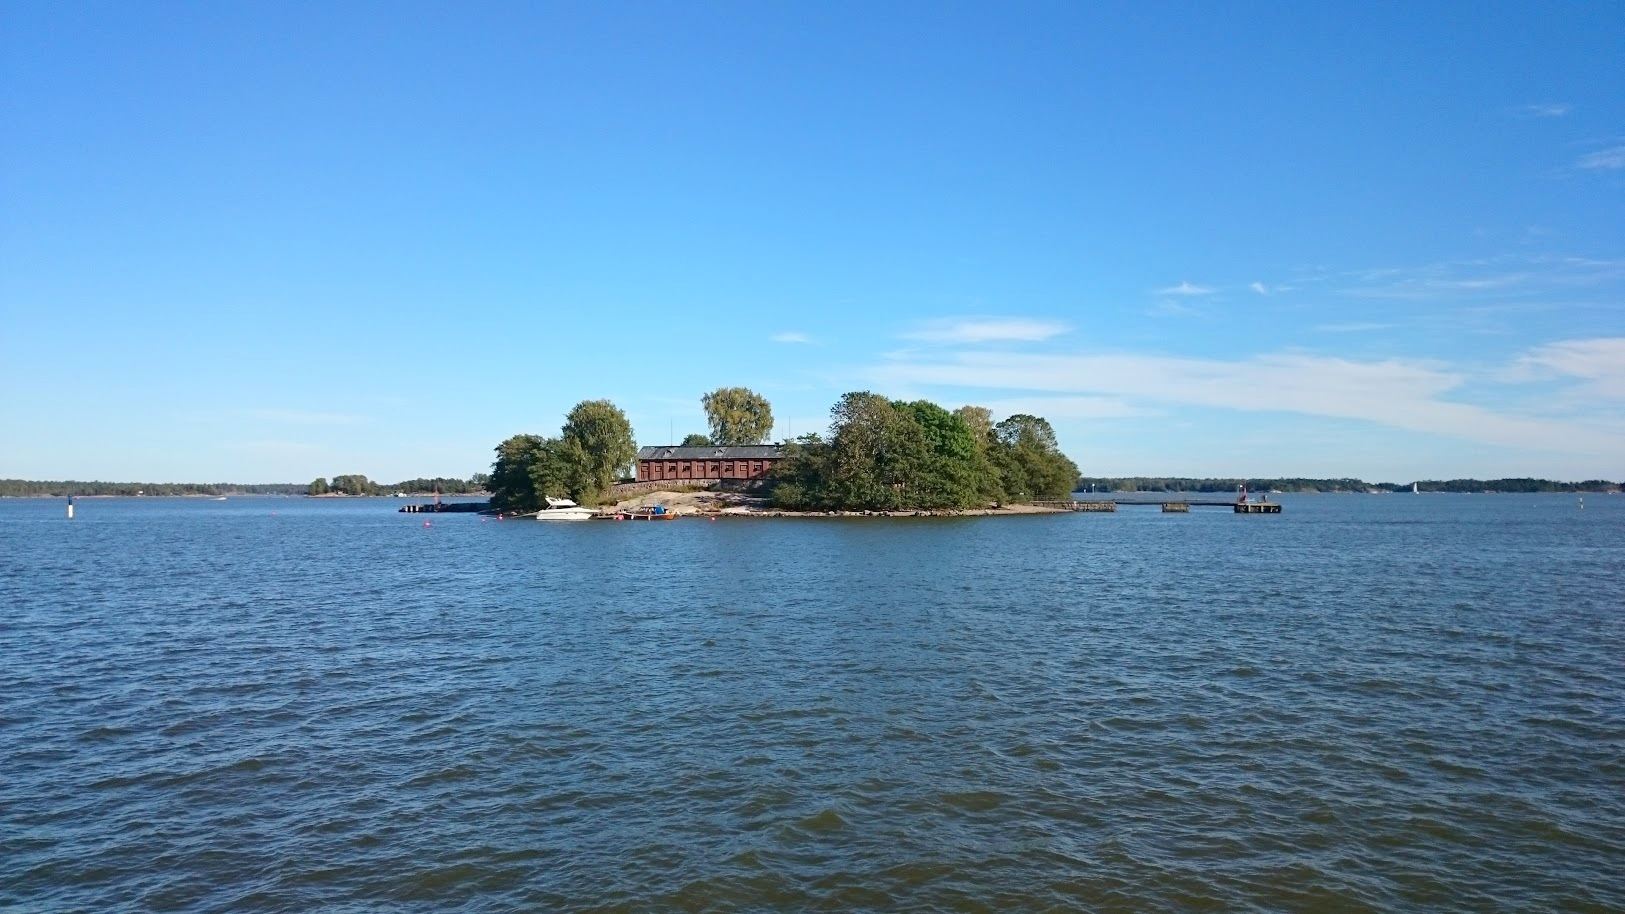 Lonna saari